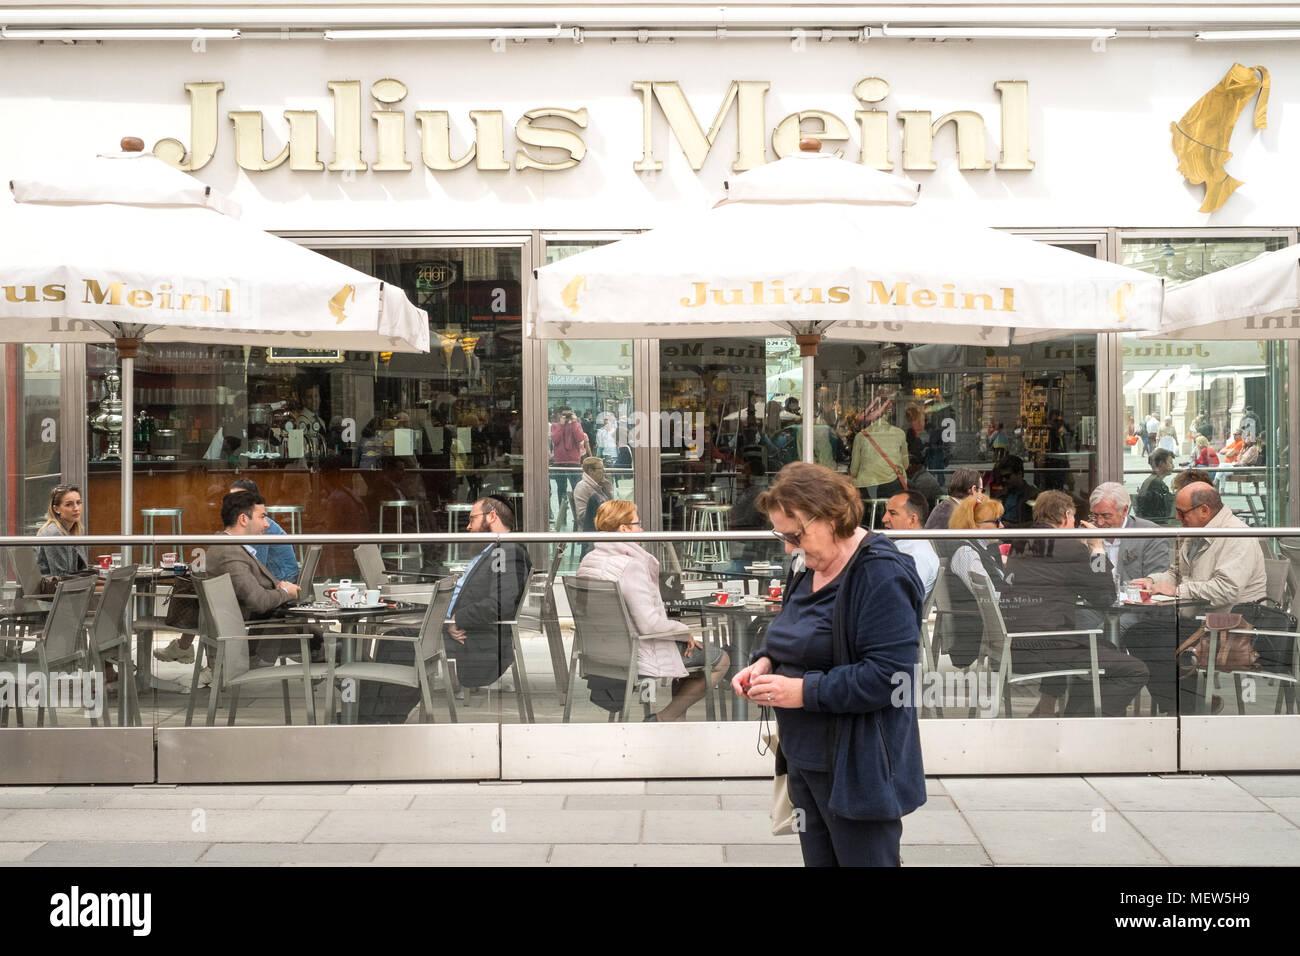 Julius Meinl Shop And Wustenrot Company Building Graben